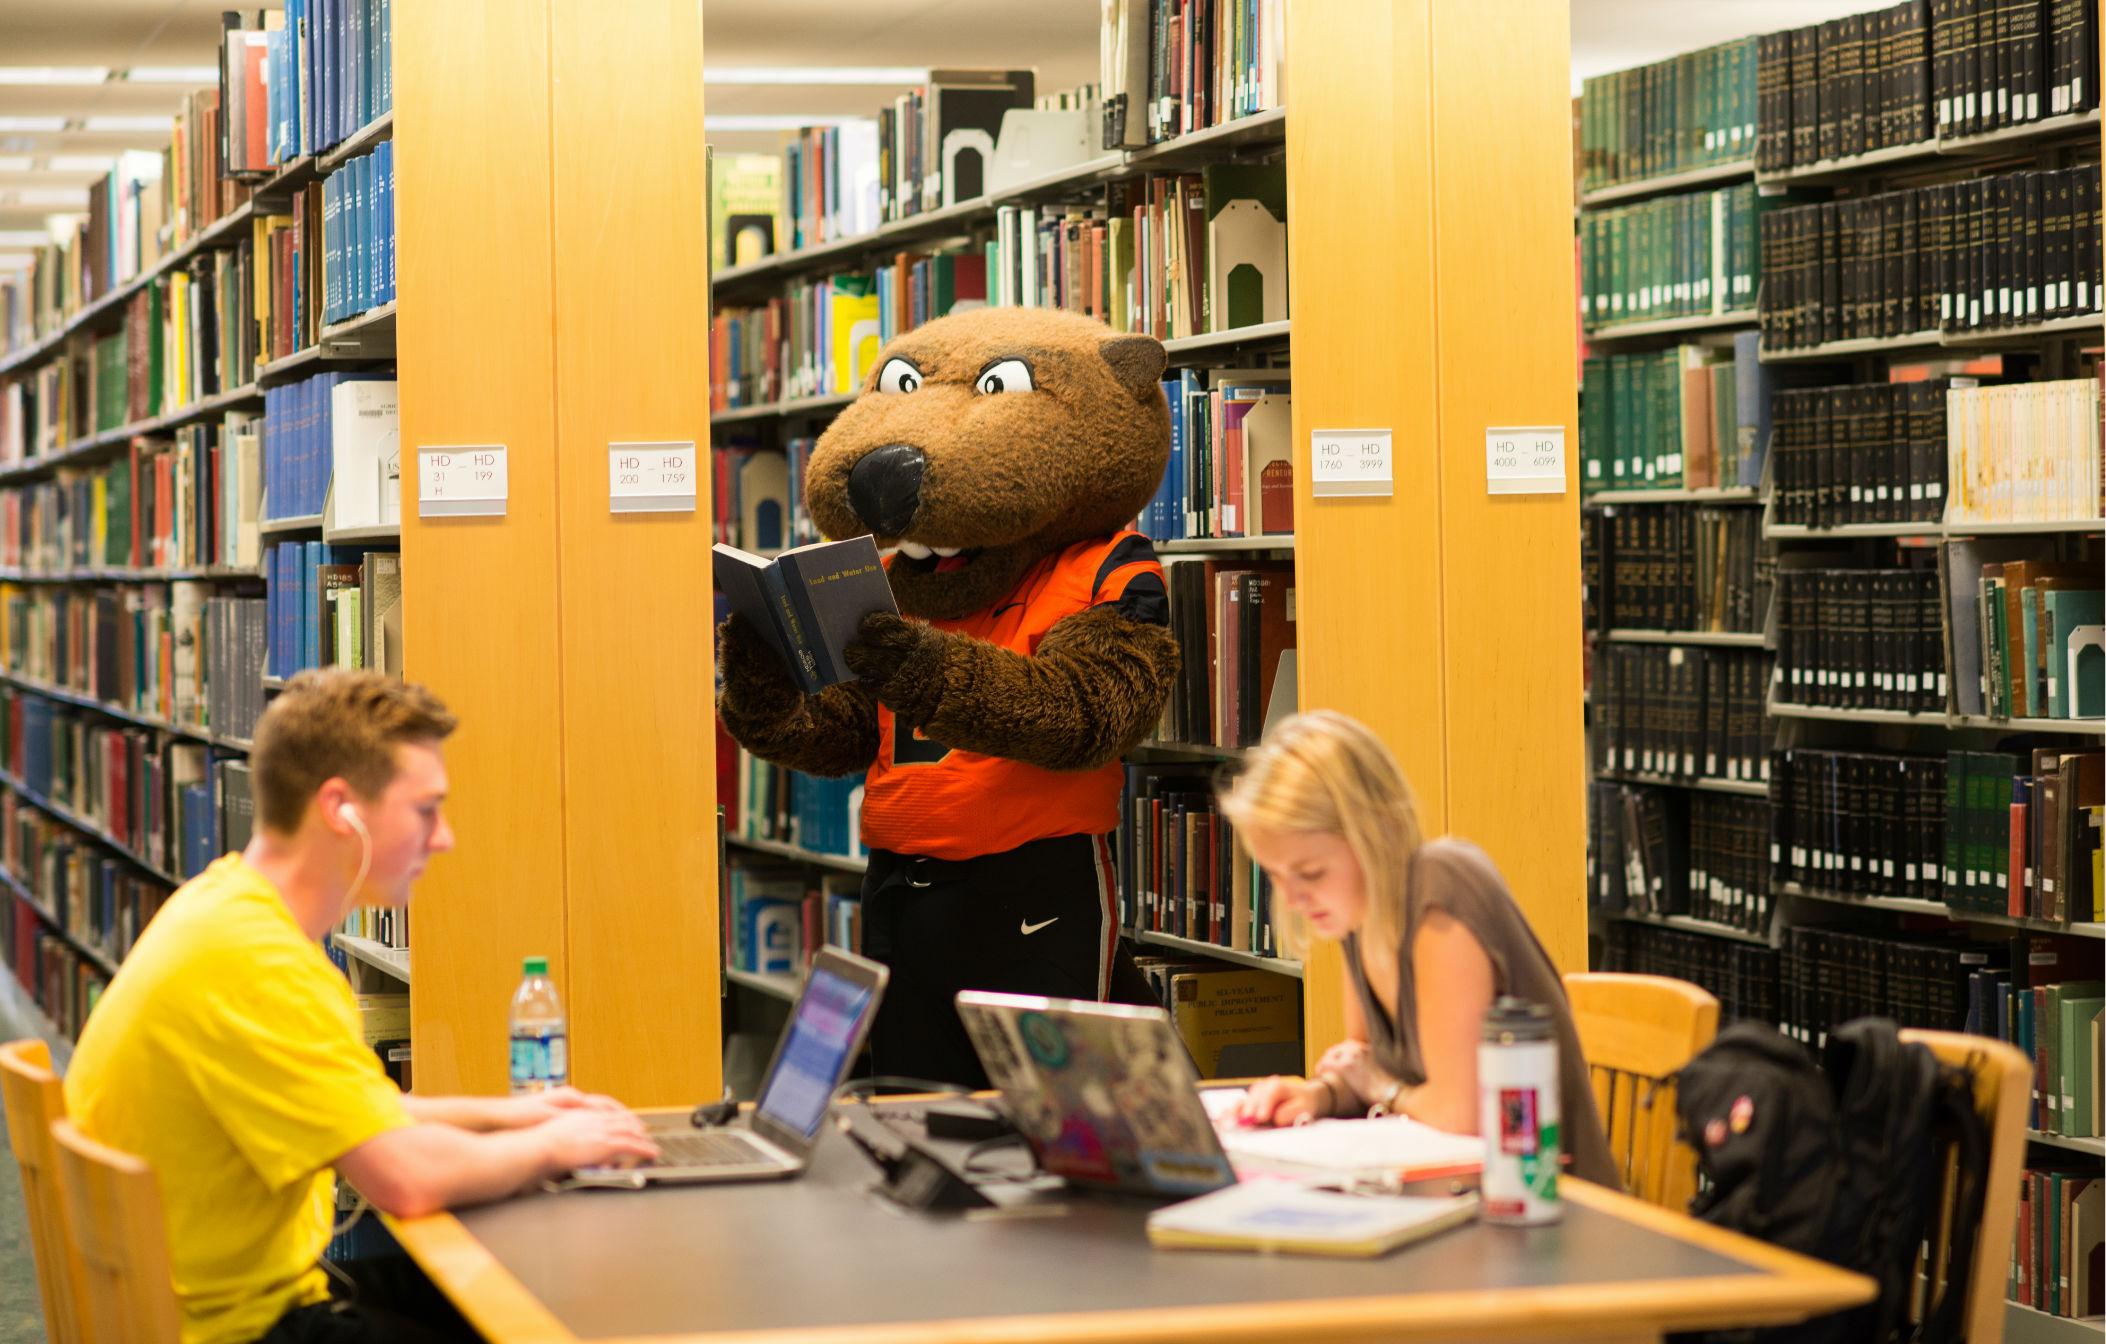 OSU mascot in library